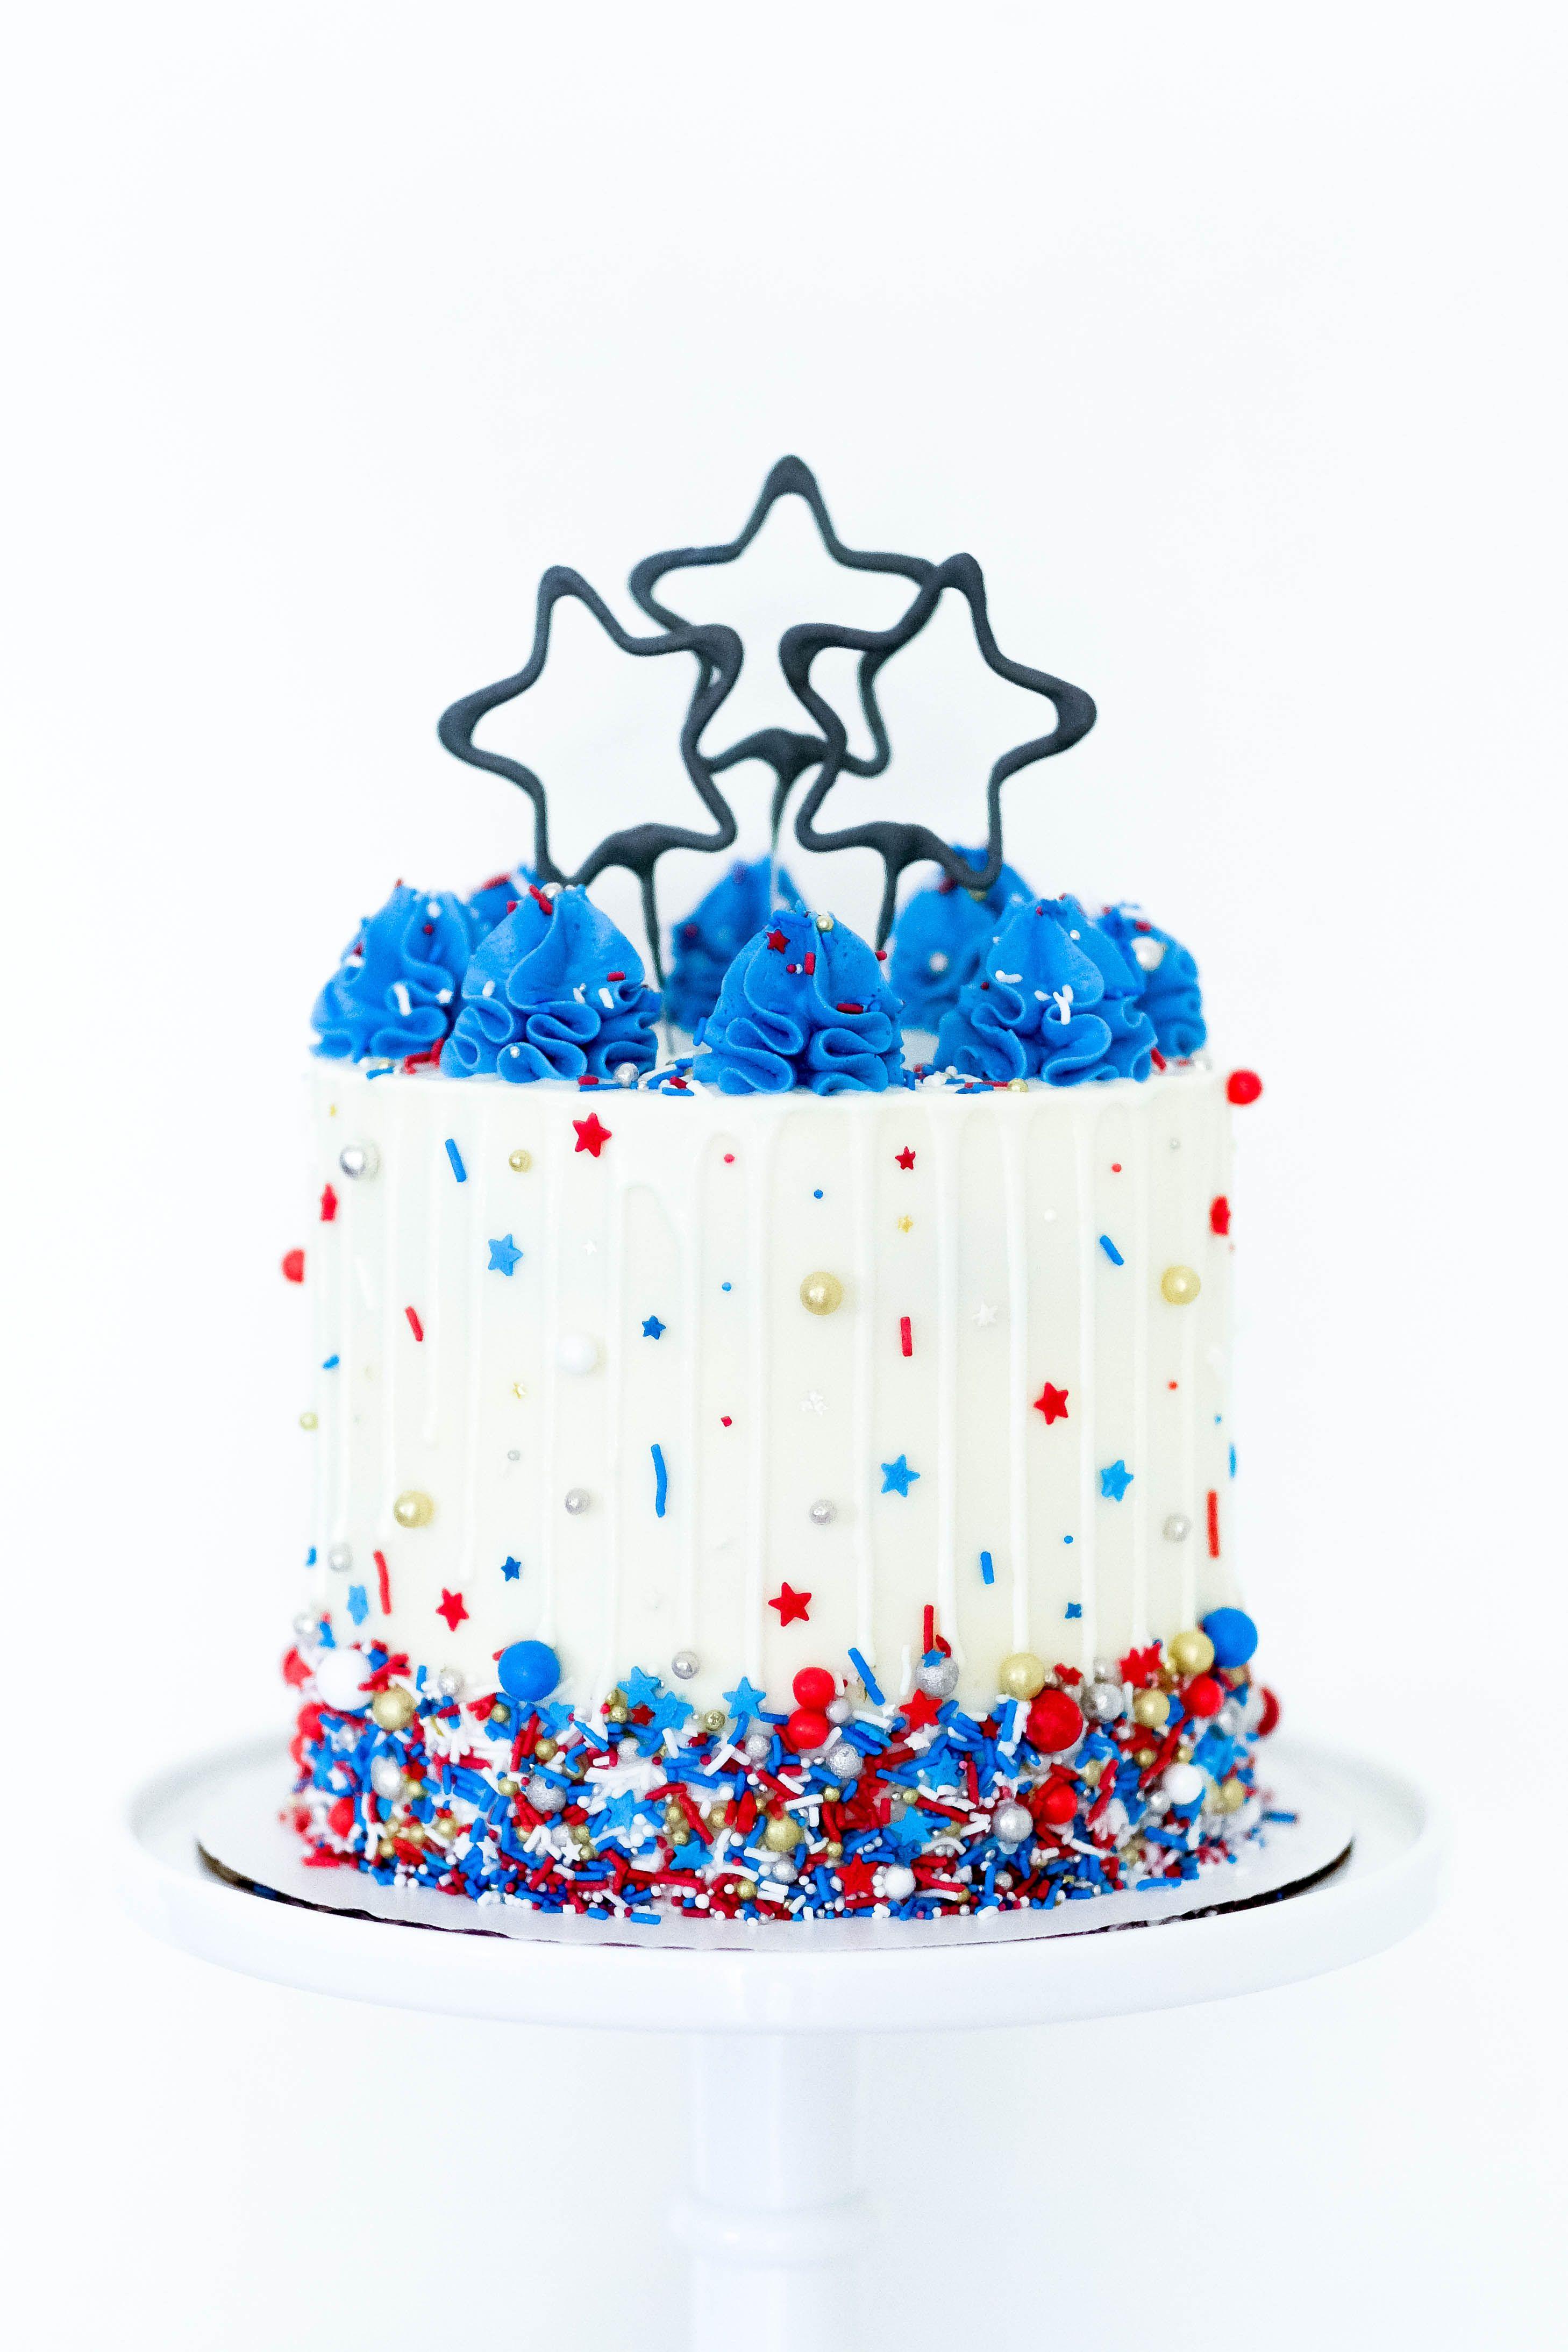 Tremendous Frostedfujicakes 4Th Of July Cake Sprinkle Cake Drip Cake Funny Birthday Cards Online Inifofree Goldxyz